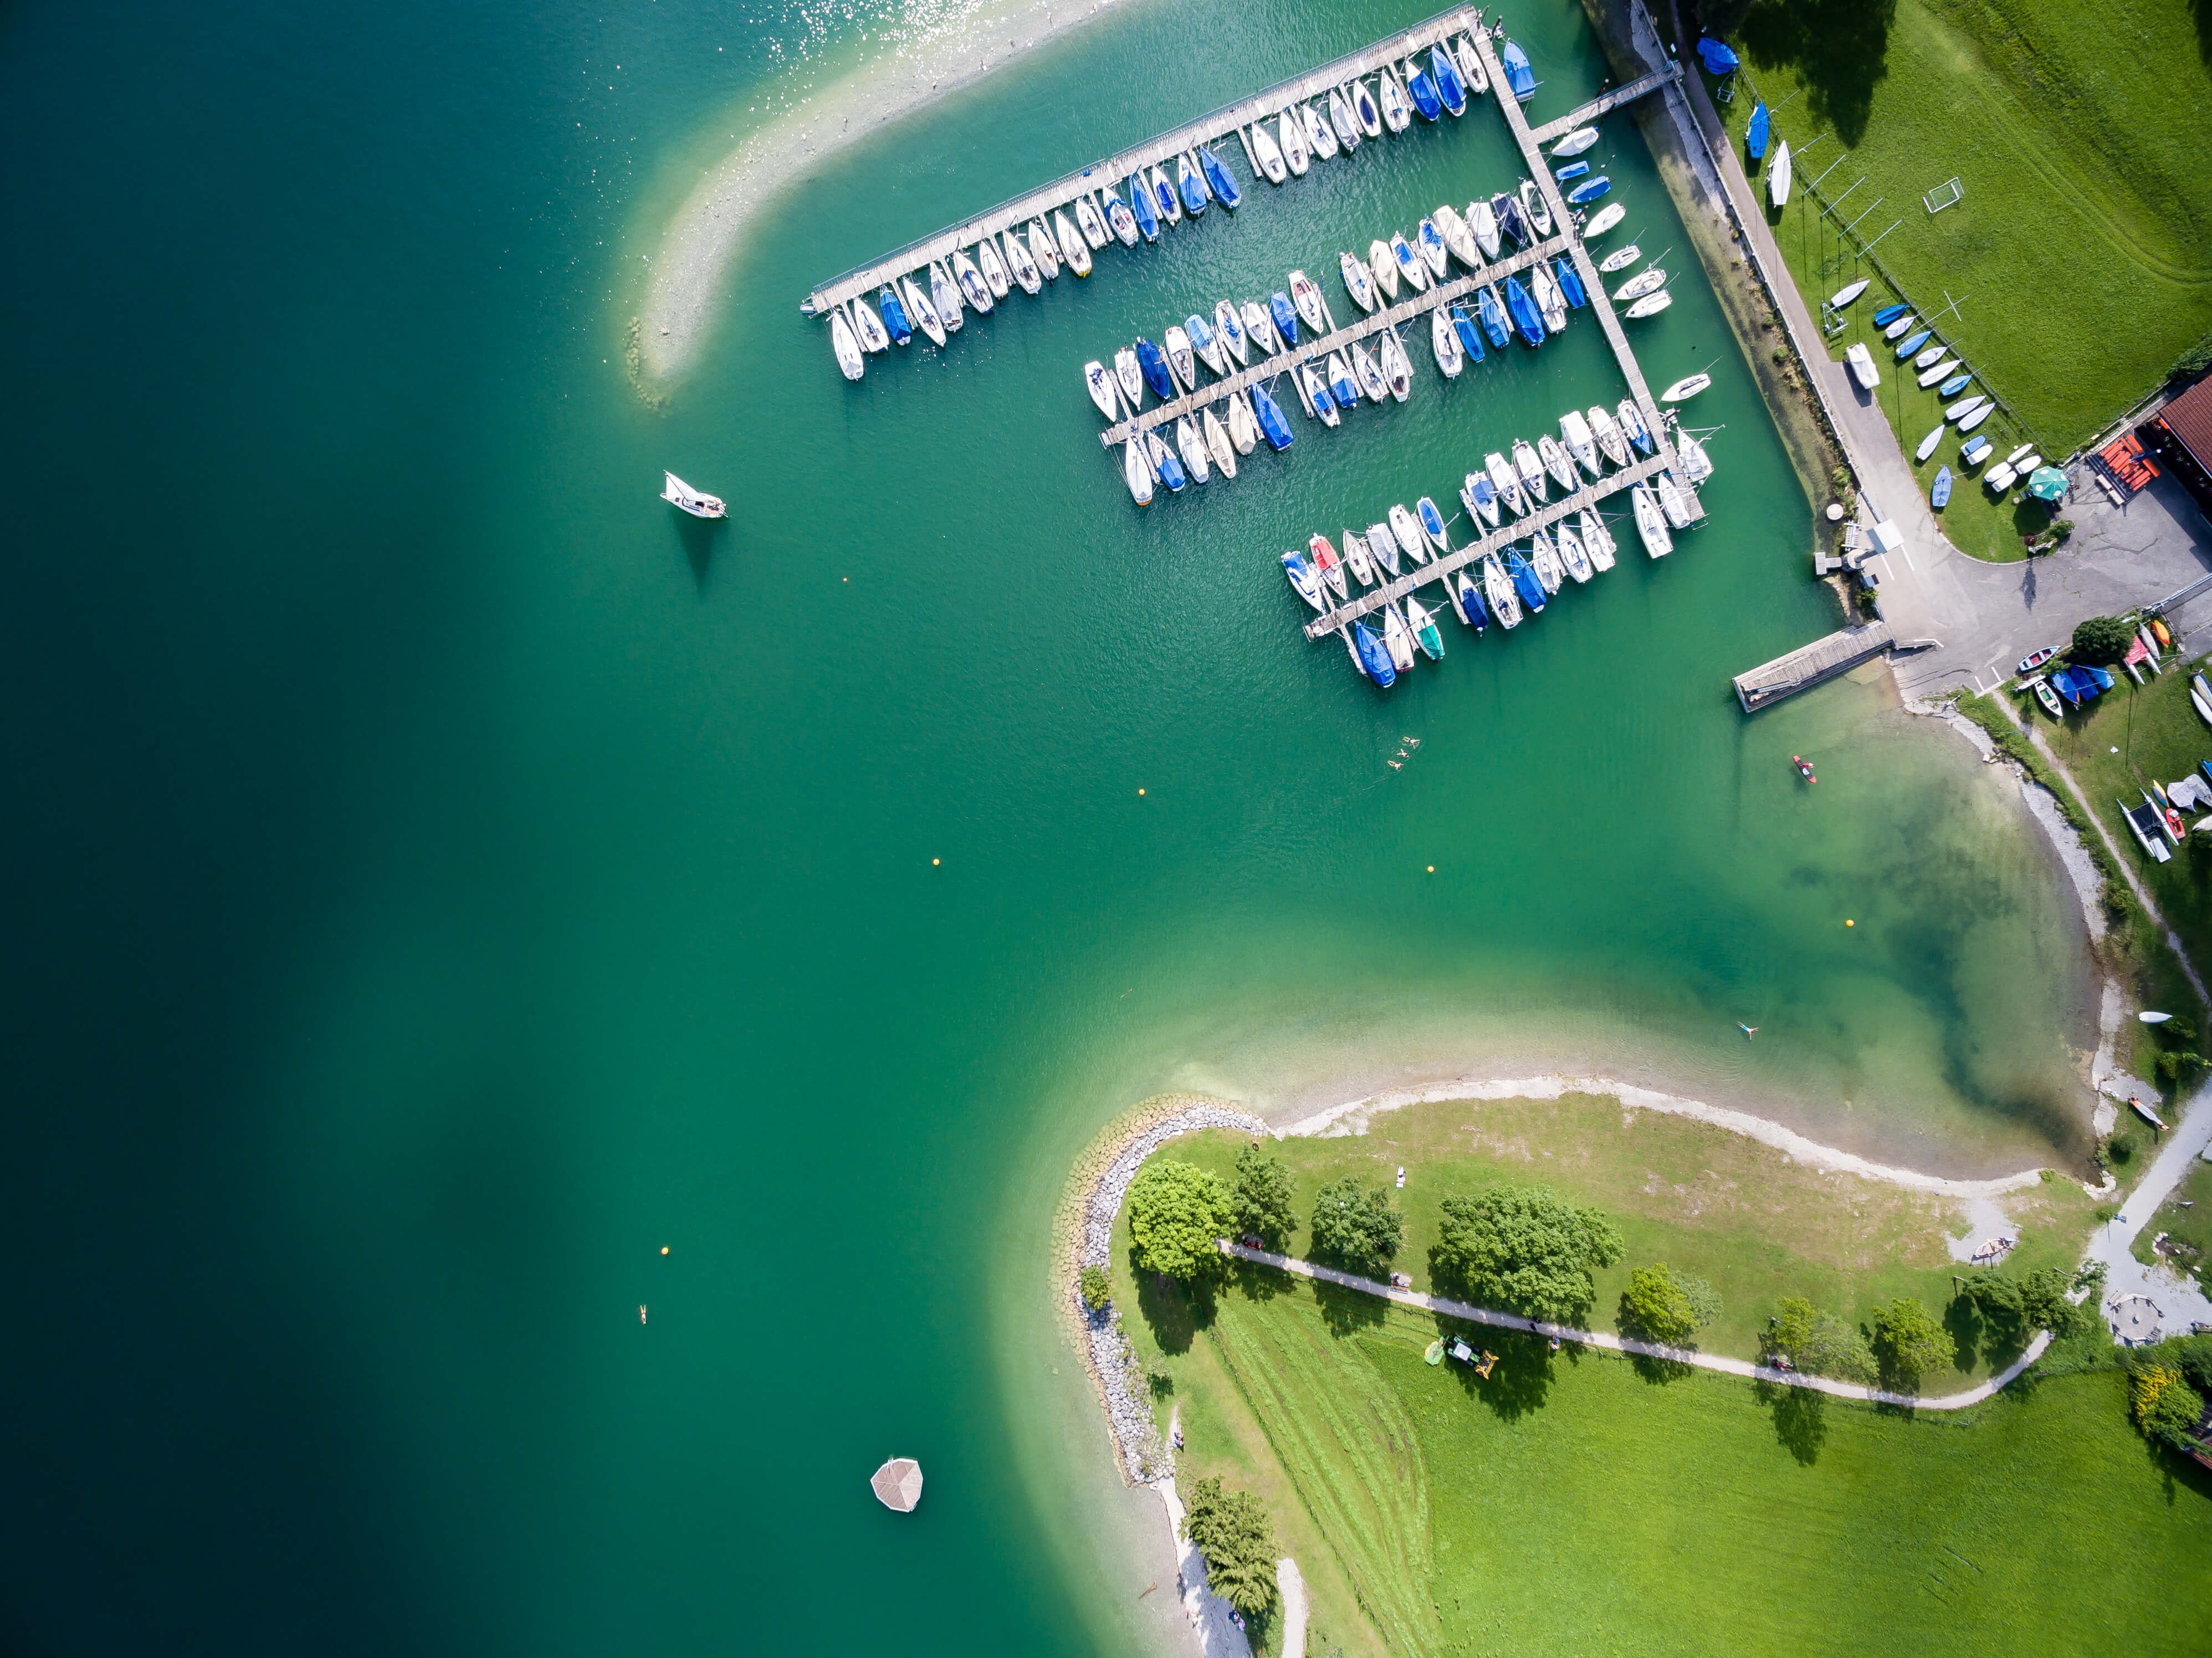 bird's eye view of boats near the dock